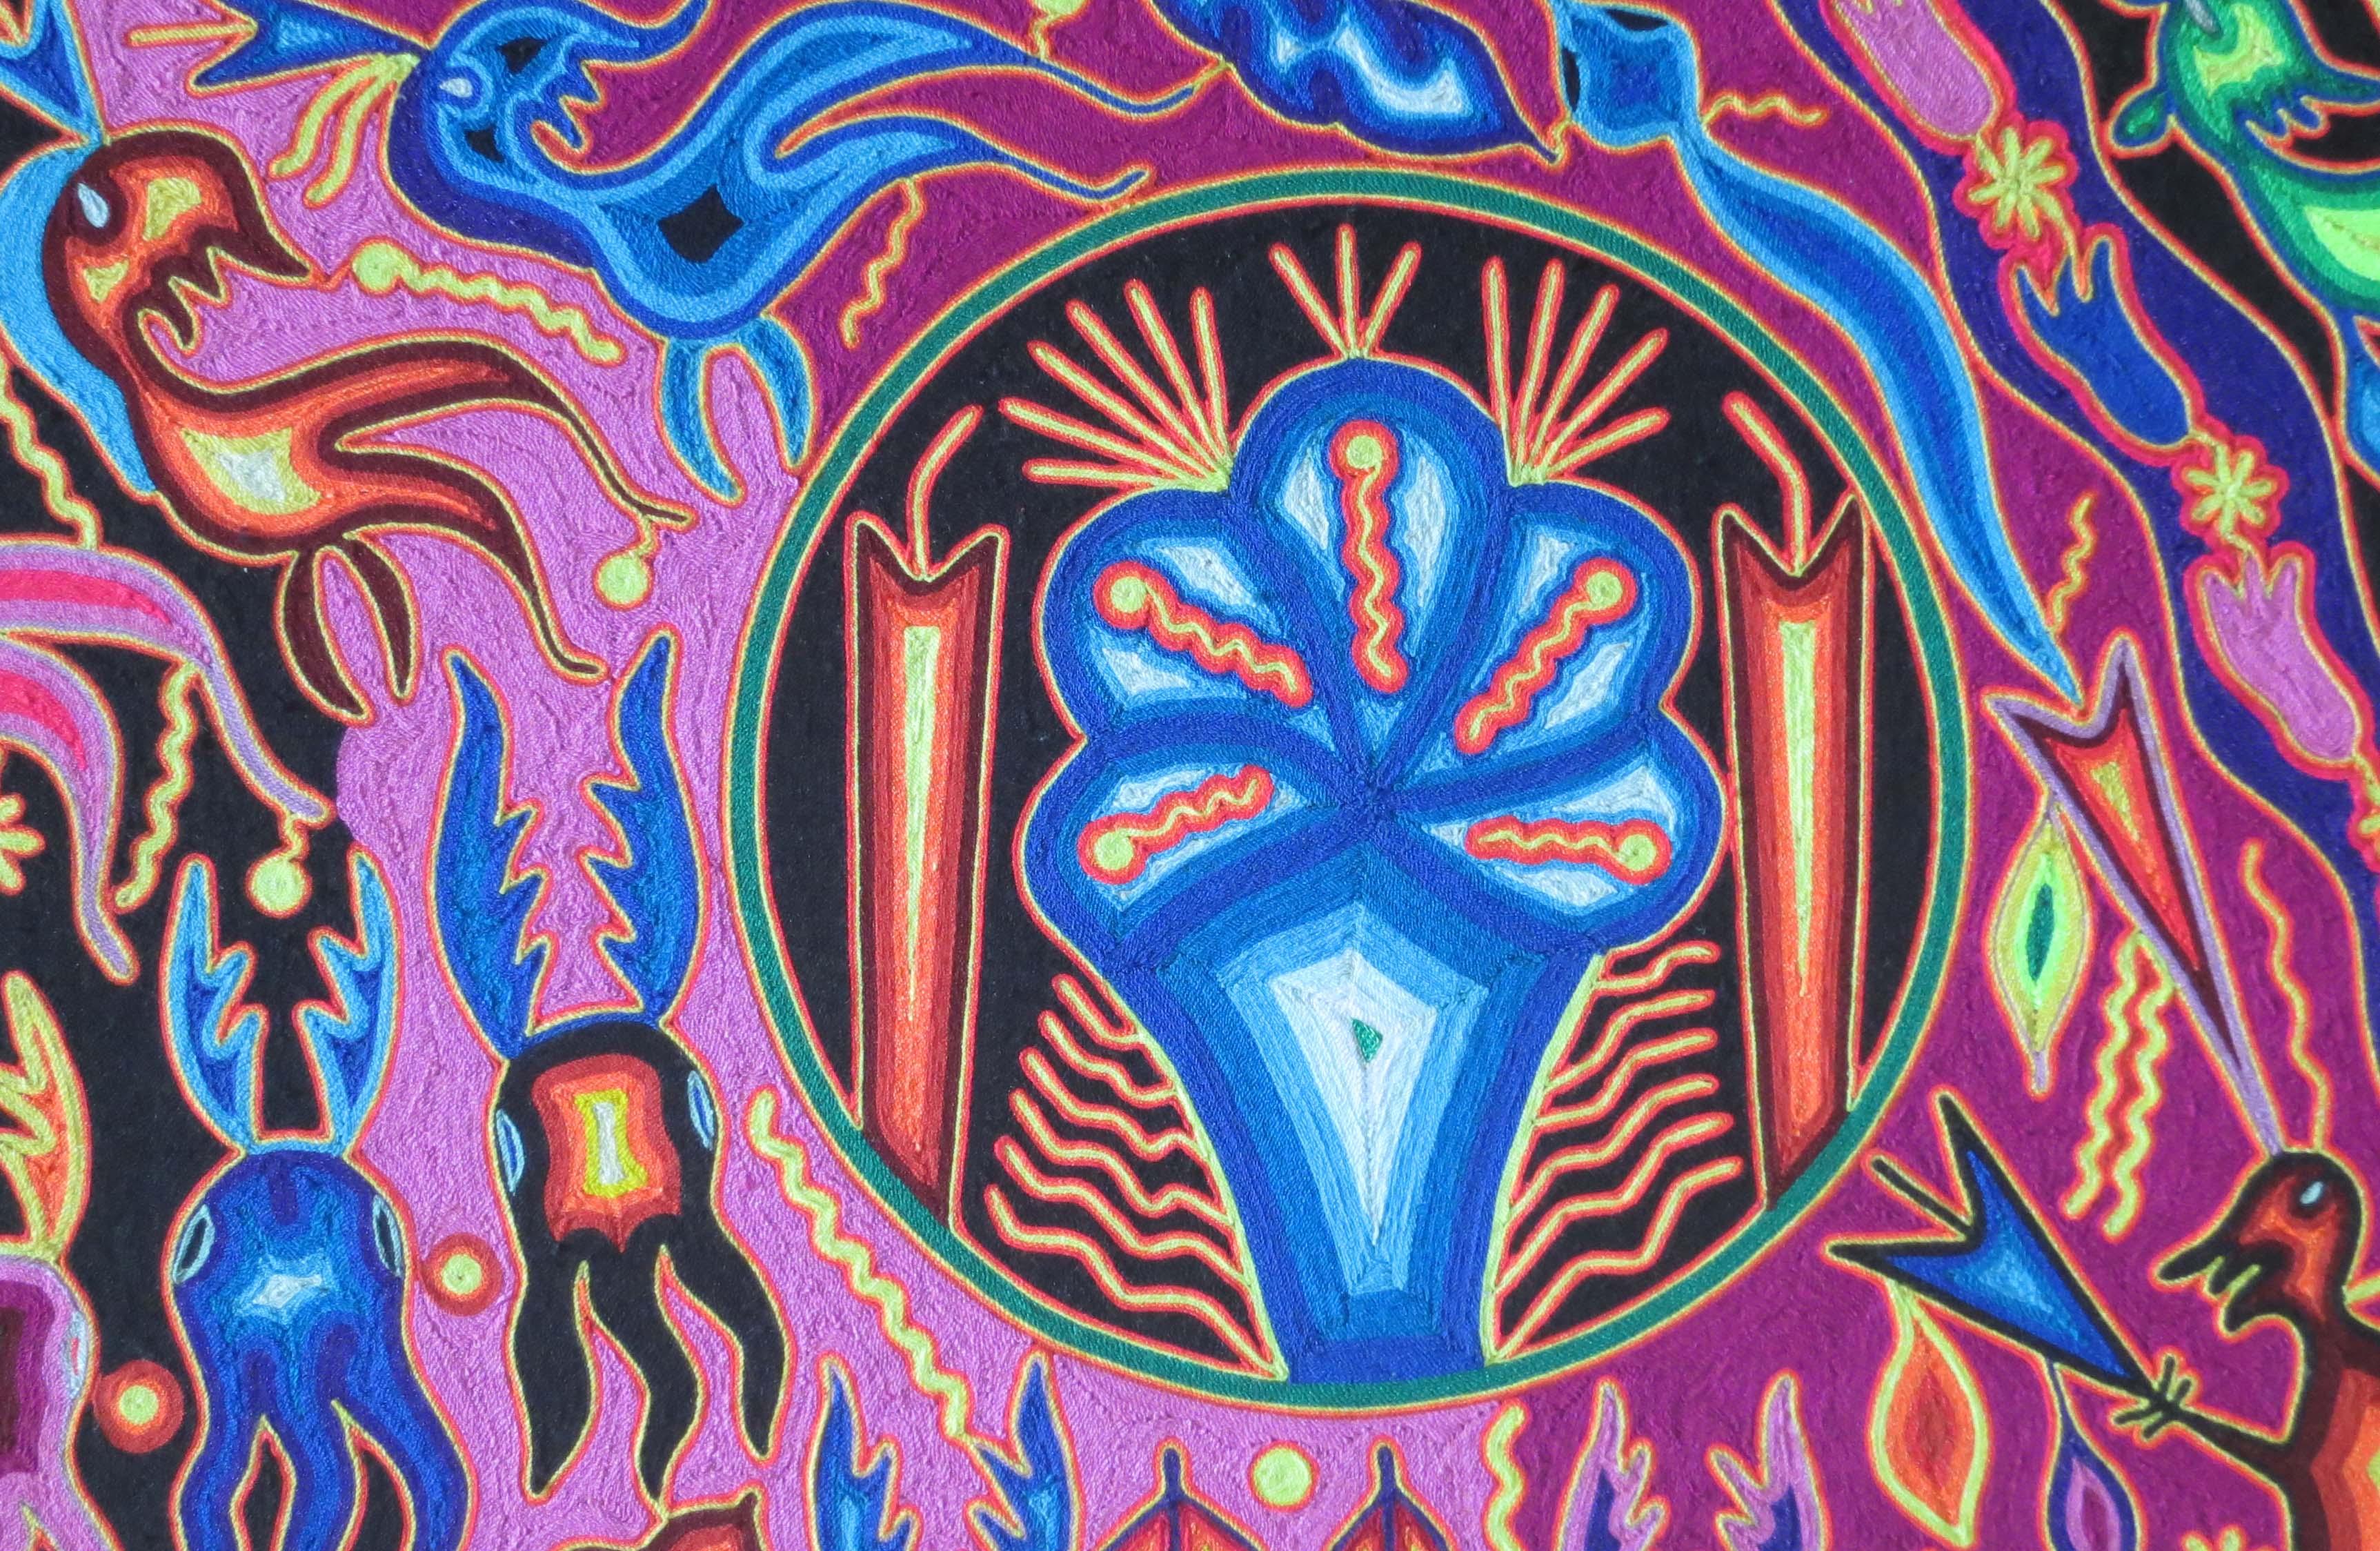 Huichol Art Center Huichol Yarn Art Photo by